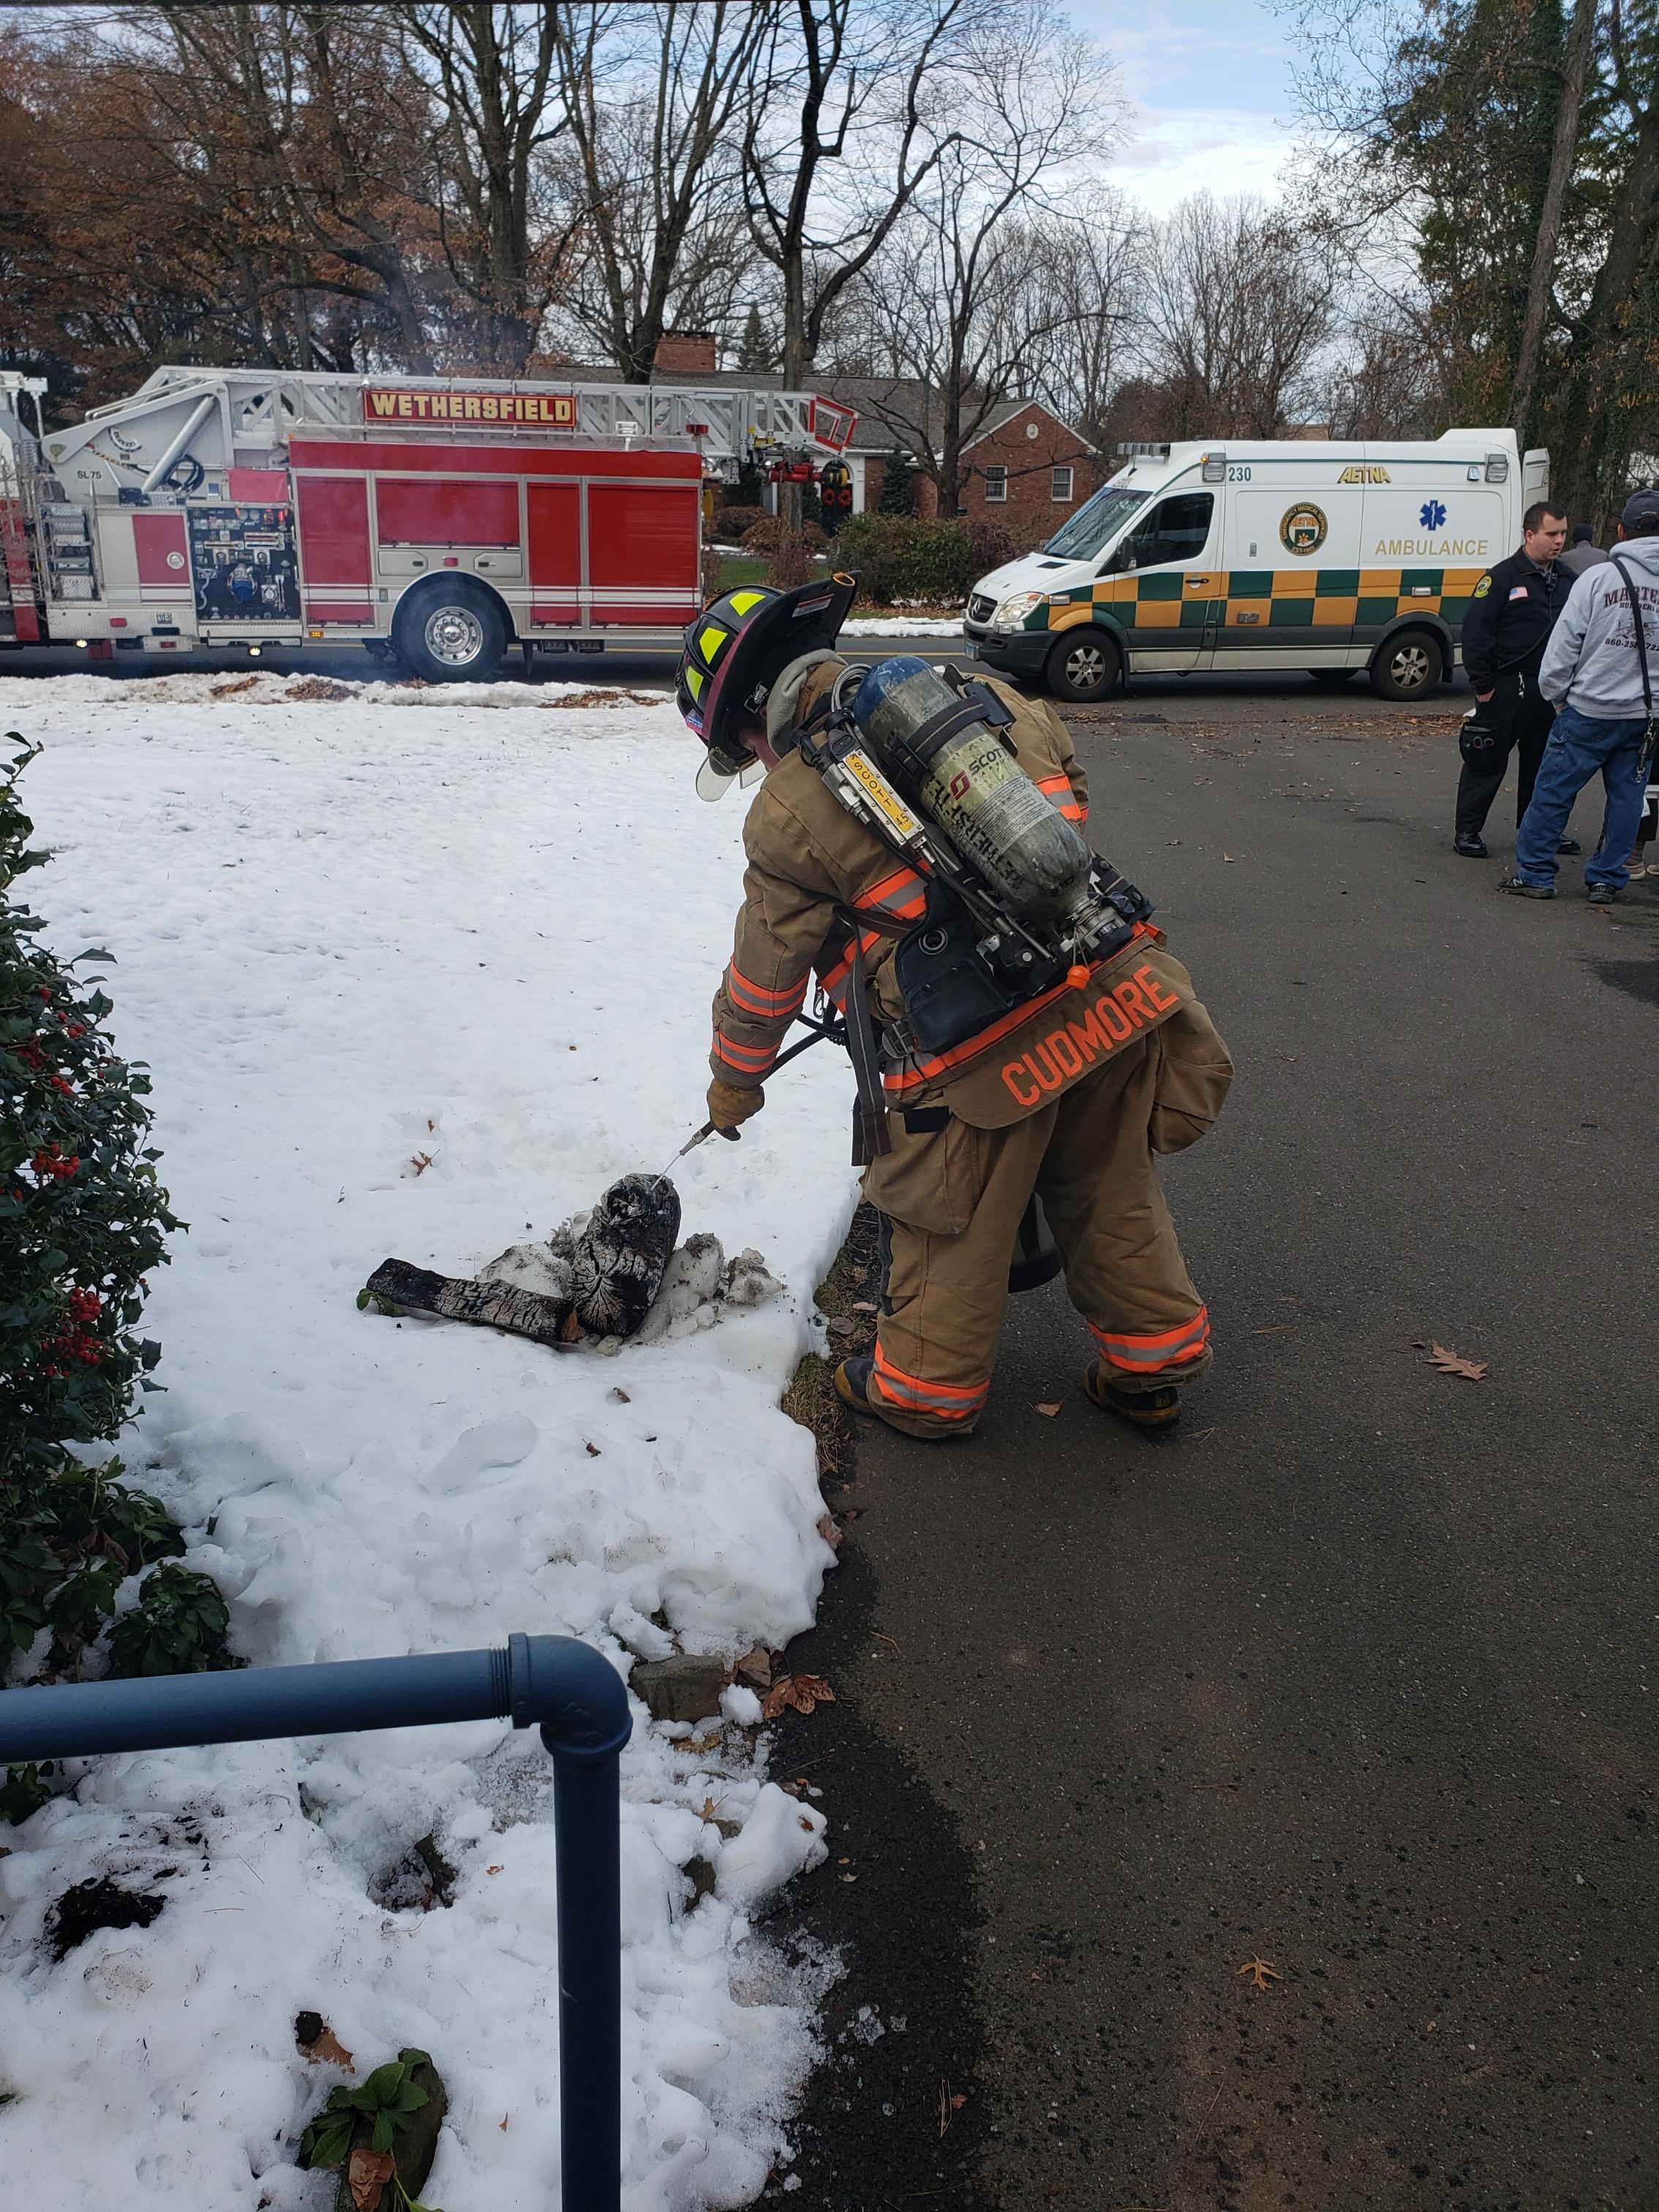 Highland St Fireplace Malfunction